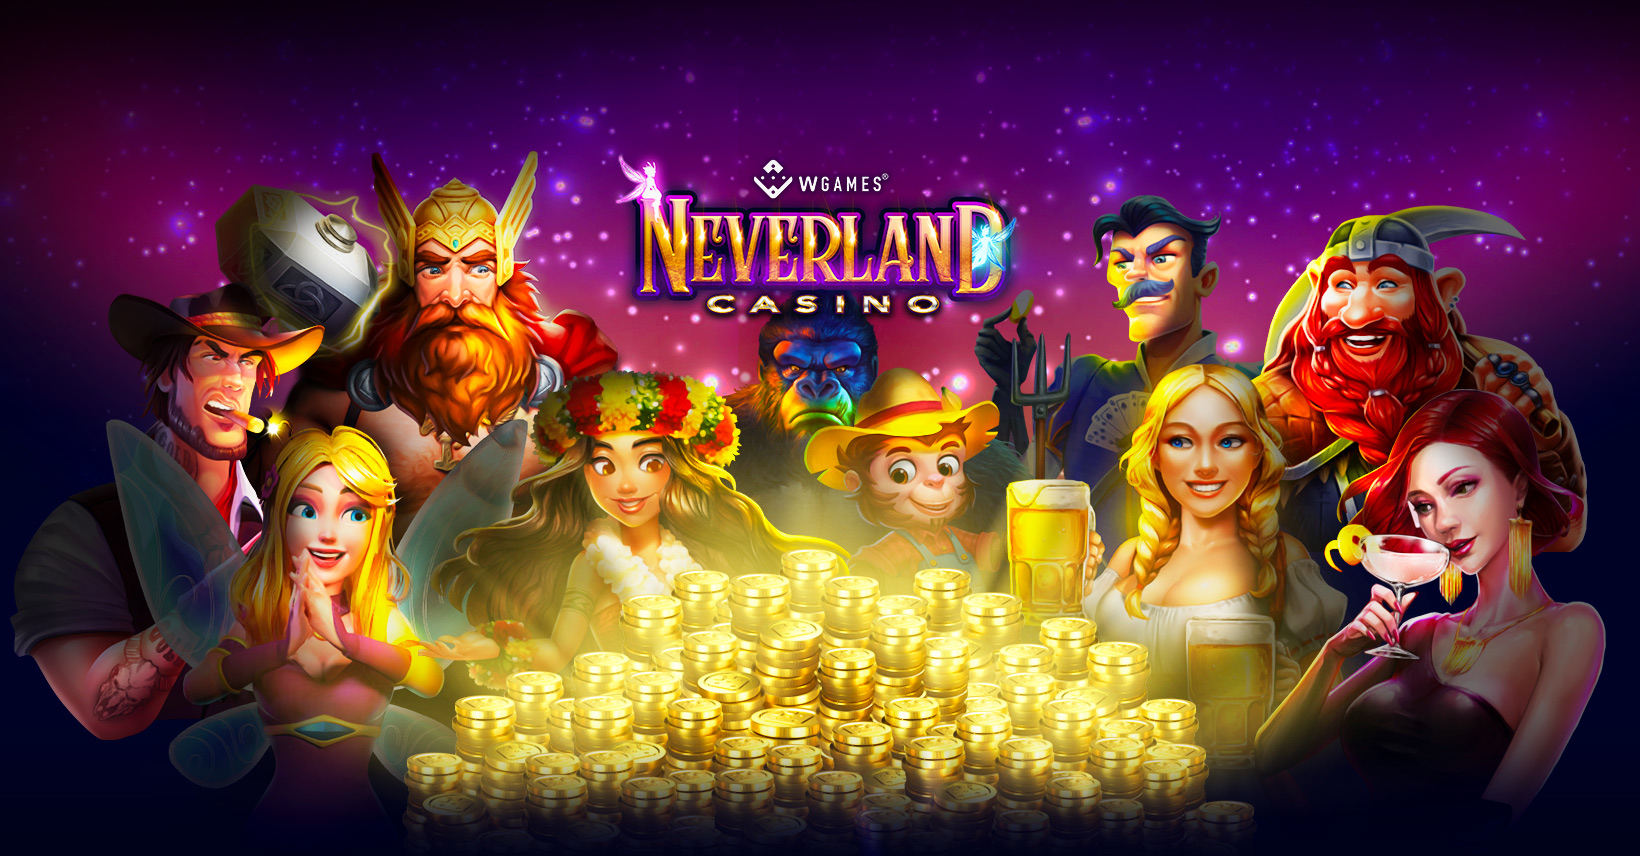 Neverland Casino